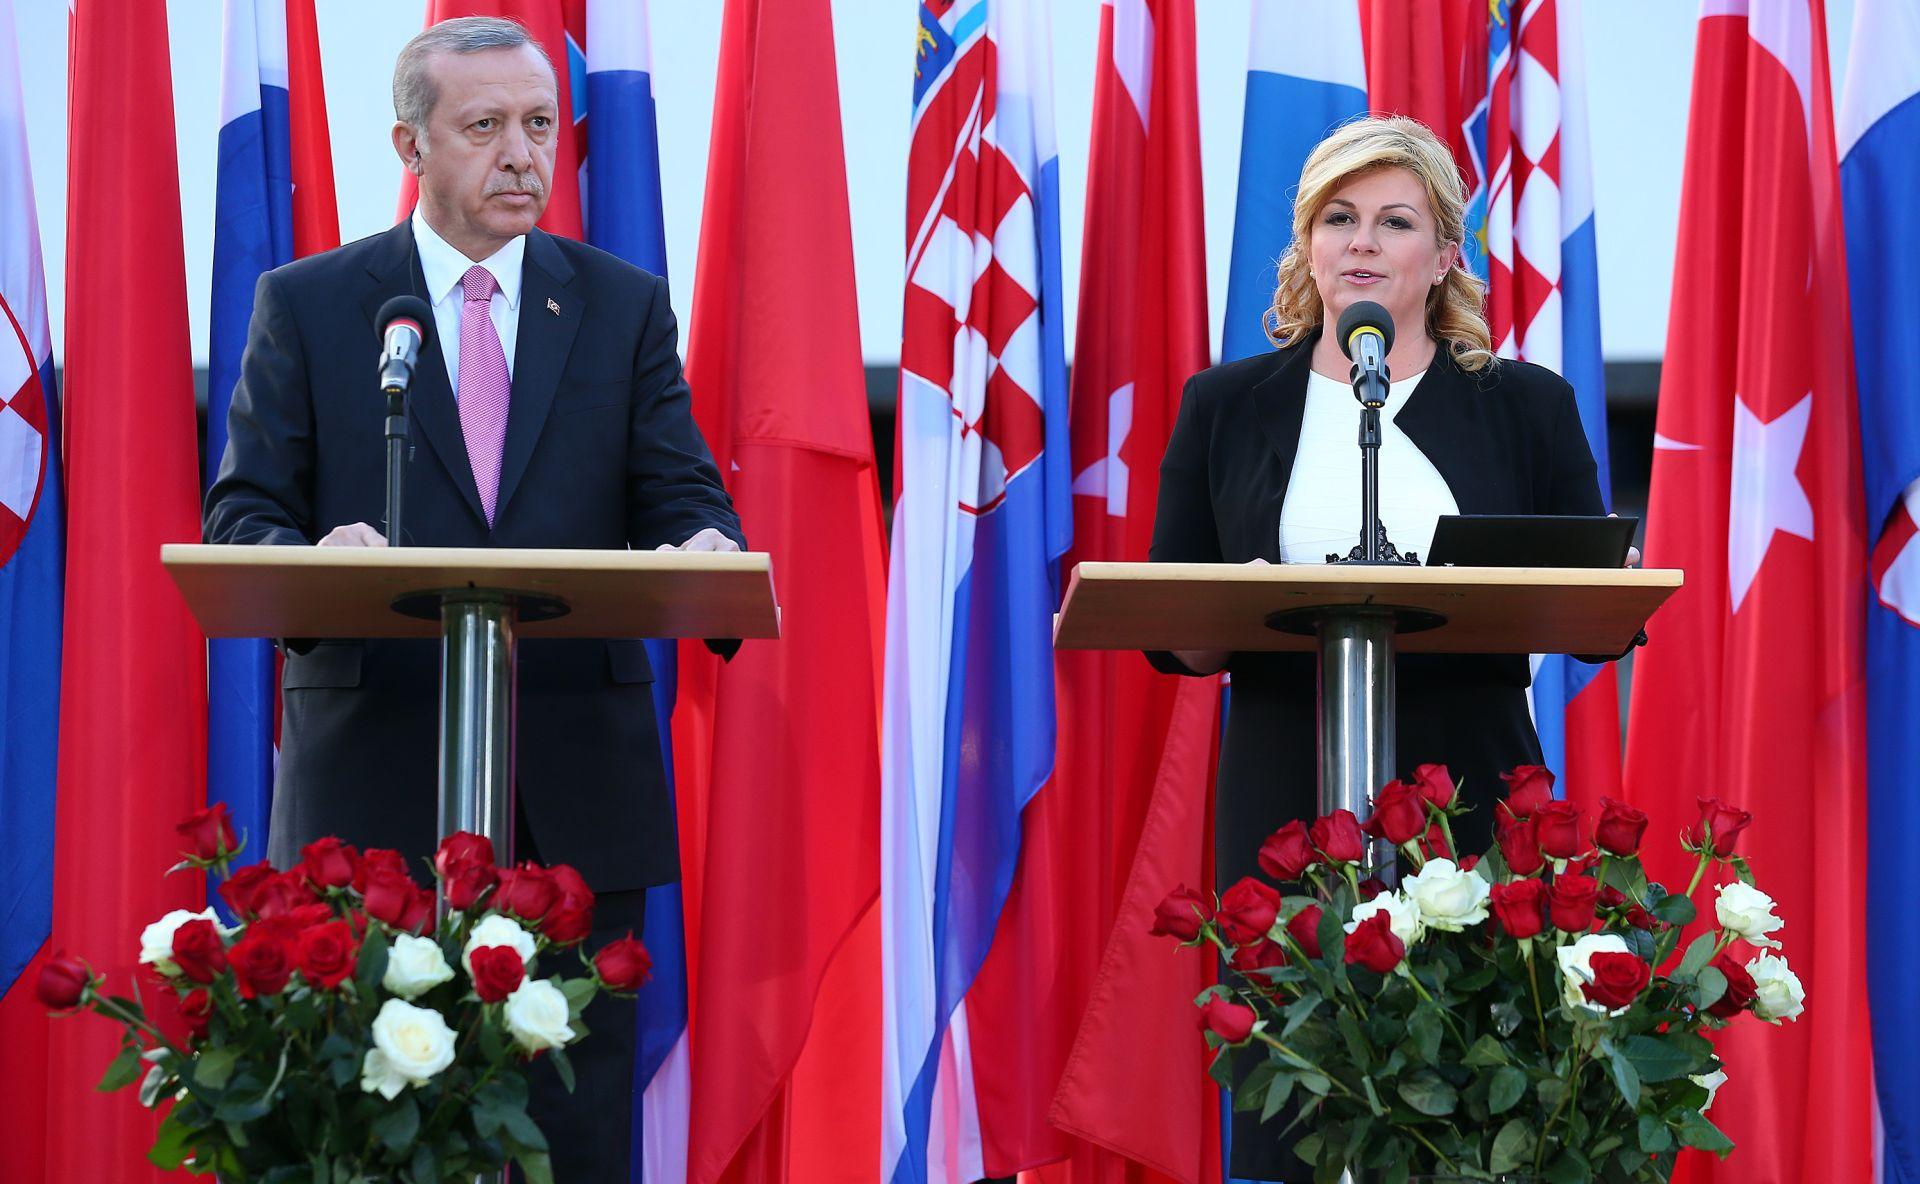 TURSKI PREDSJEDNIK U ZAGREBU: 'Želim da gospodarska razmjena između Turske i Hrvatske dosegne milijardu dolara'